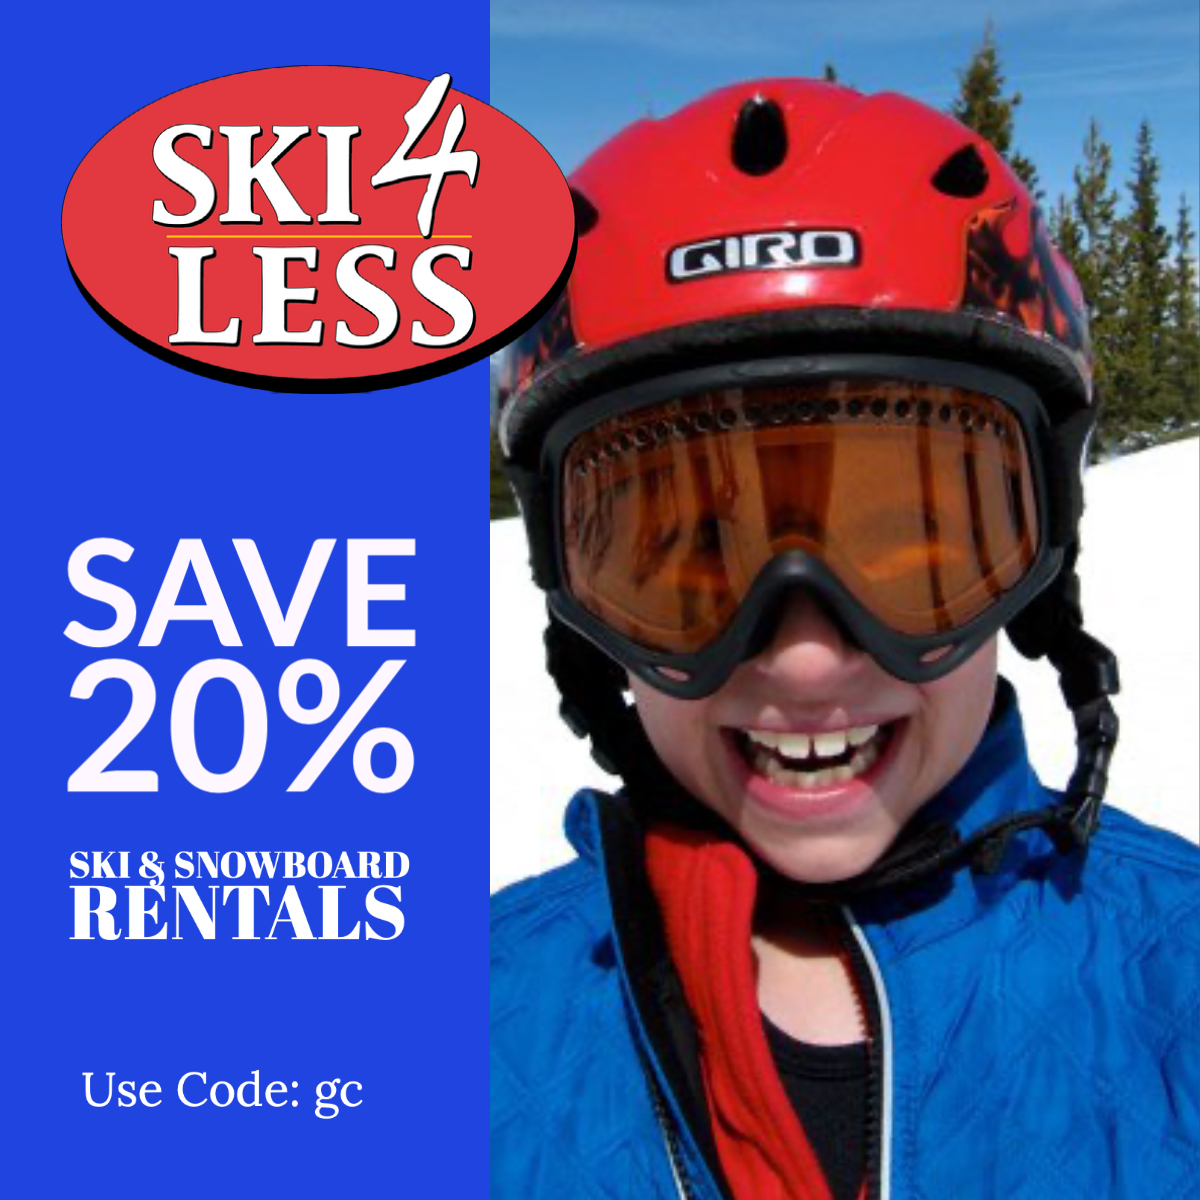 Save 20% Winter Park Ski Rental Ski4Less